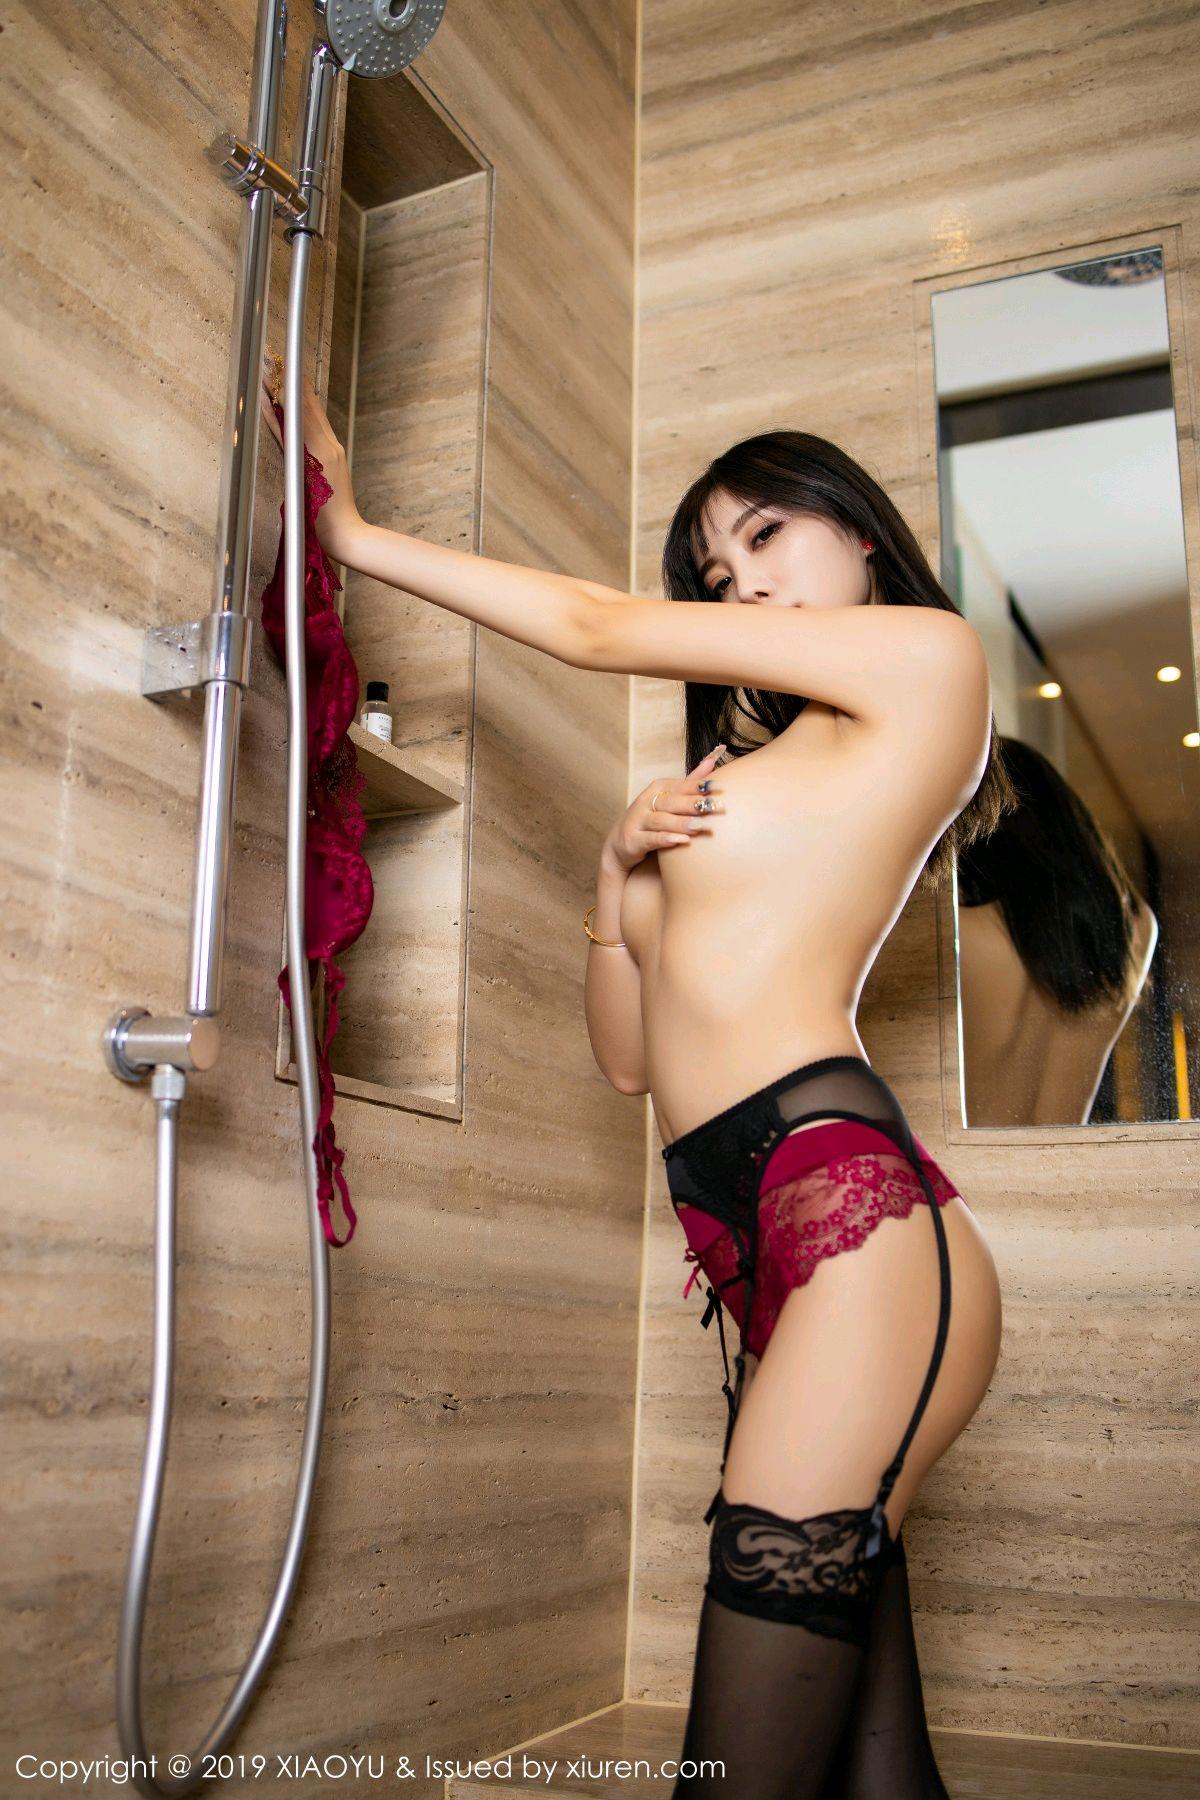 [XiaoYu] Vol.153 Yang Chen Chen 76P, Bathroom, Black Silk, Underwear, XiaoYu, Yang Chen Chen